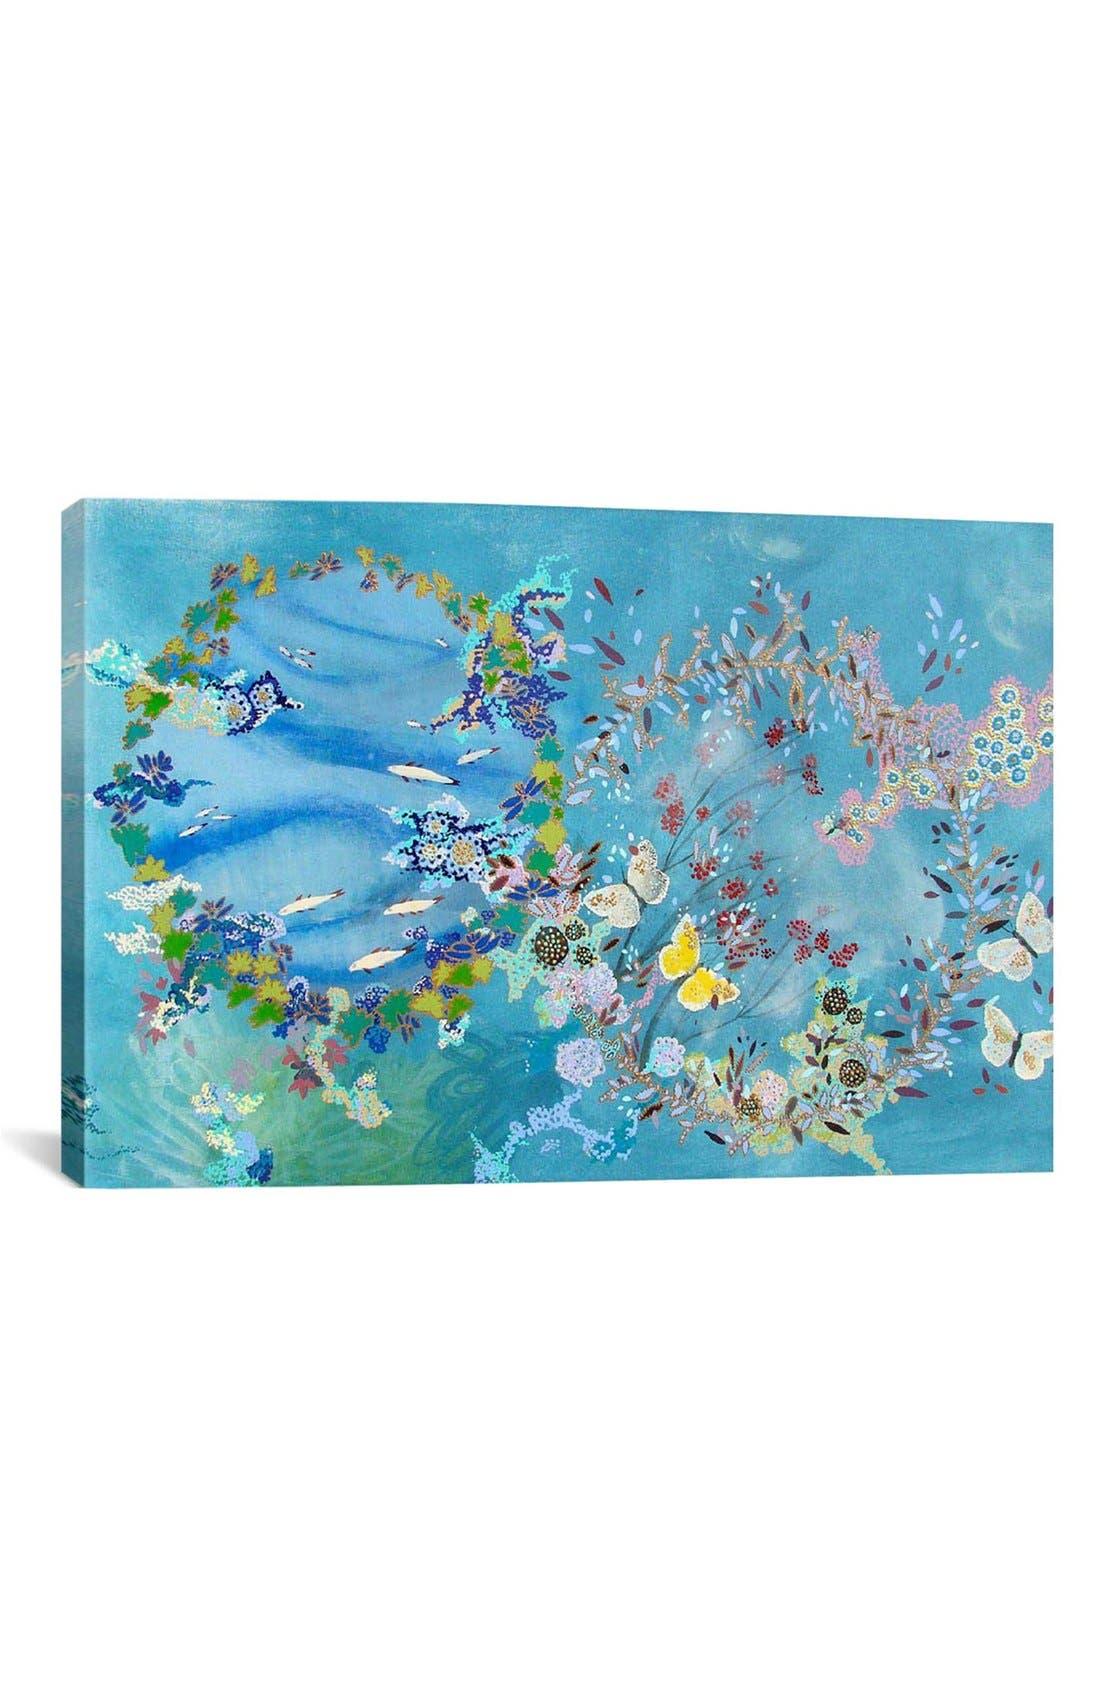 'Agua Y Aire - Lia Porto' Giclée Print Canvas Art,                         Main,                         color, 400